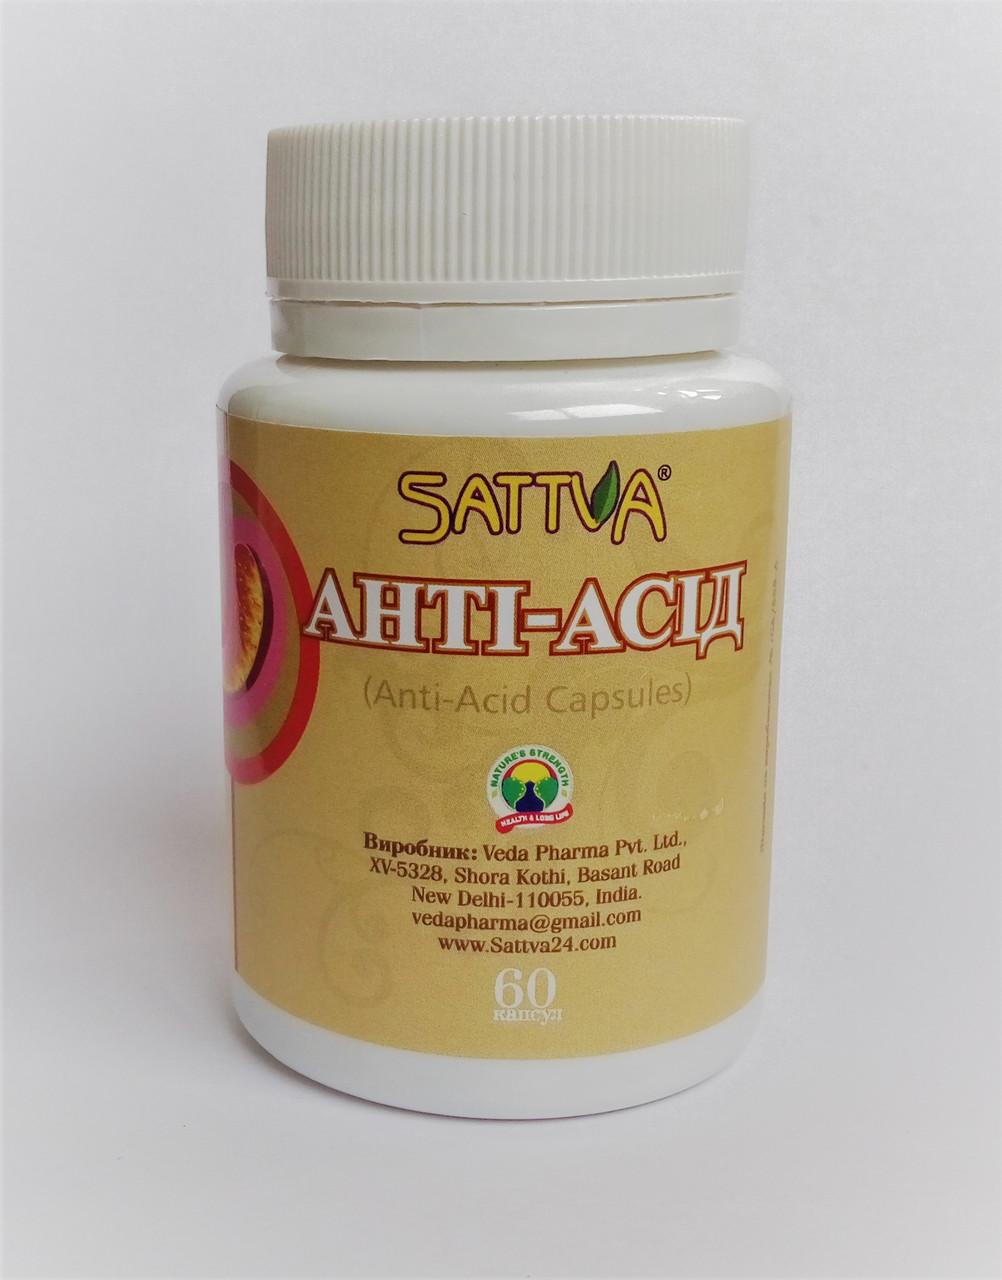 Анти-асид аюрведический препарат для снижения кислотности желудка